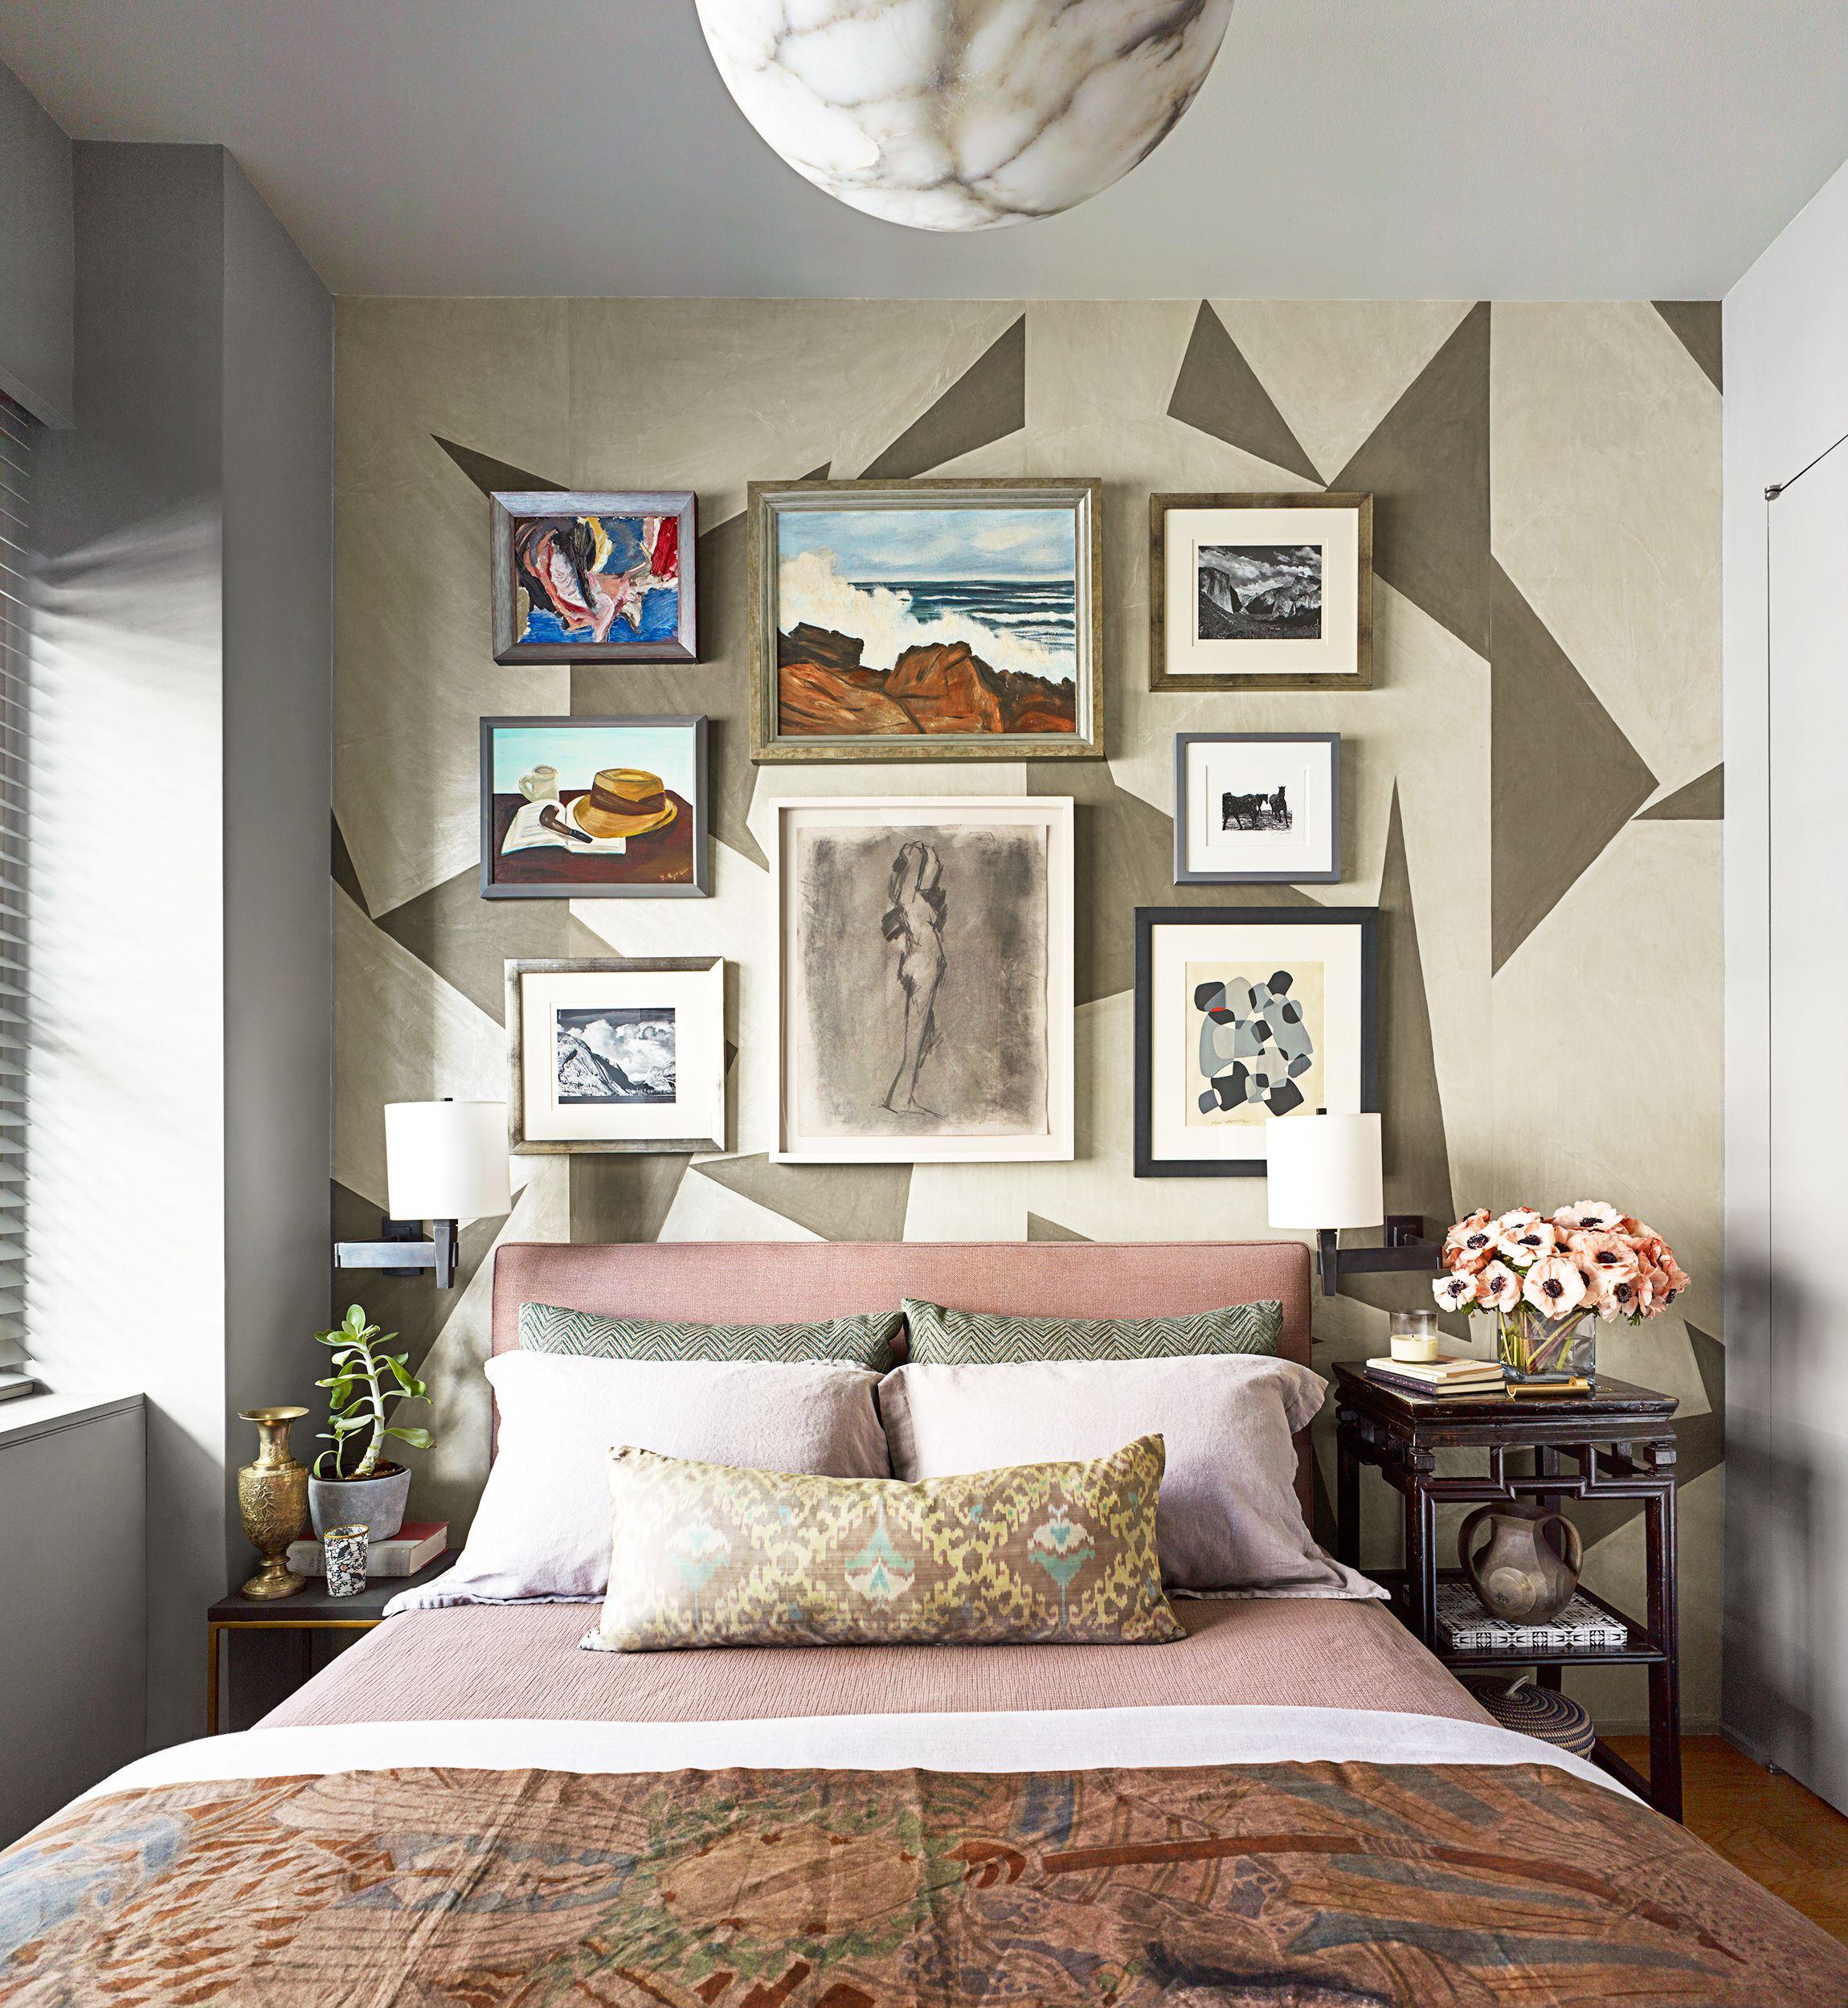 25 small bedroom design